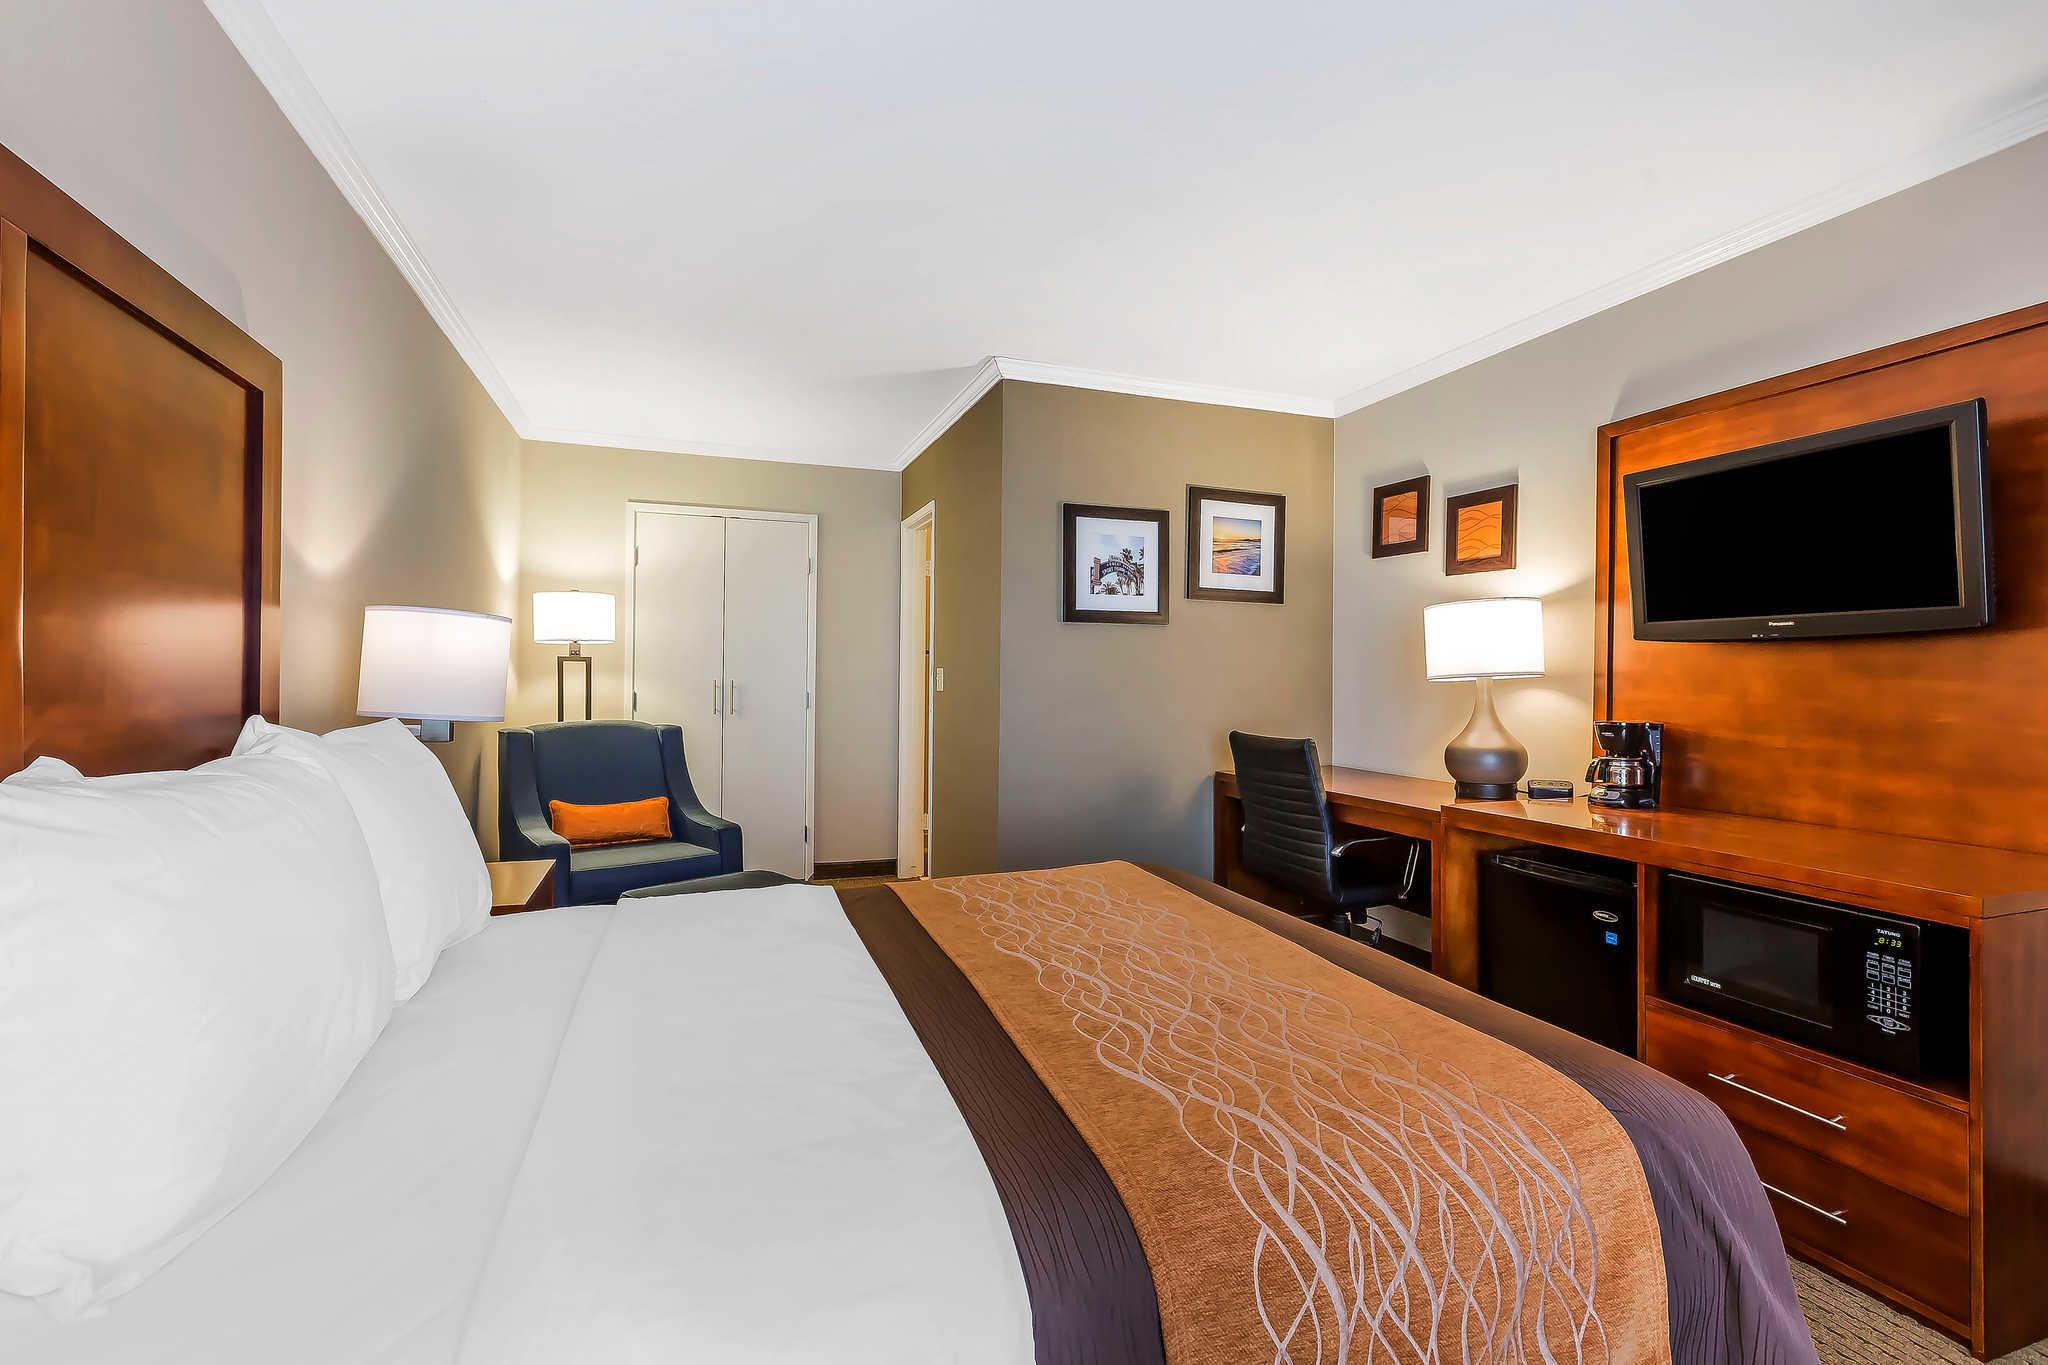 Comfort Inn Santa Monica - West Los Angeles image 28